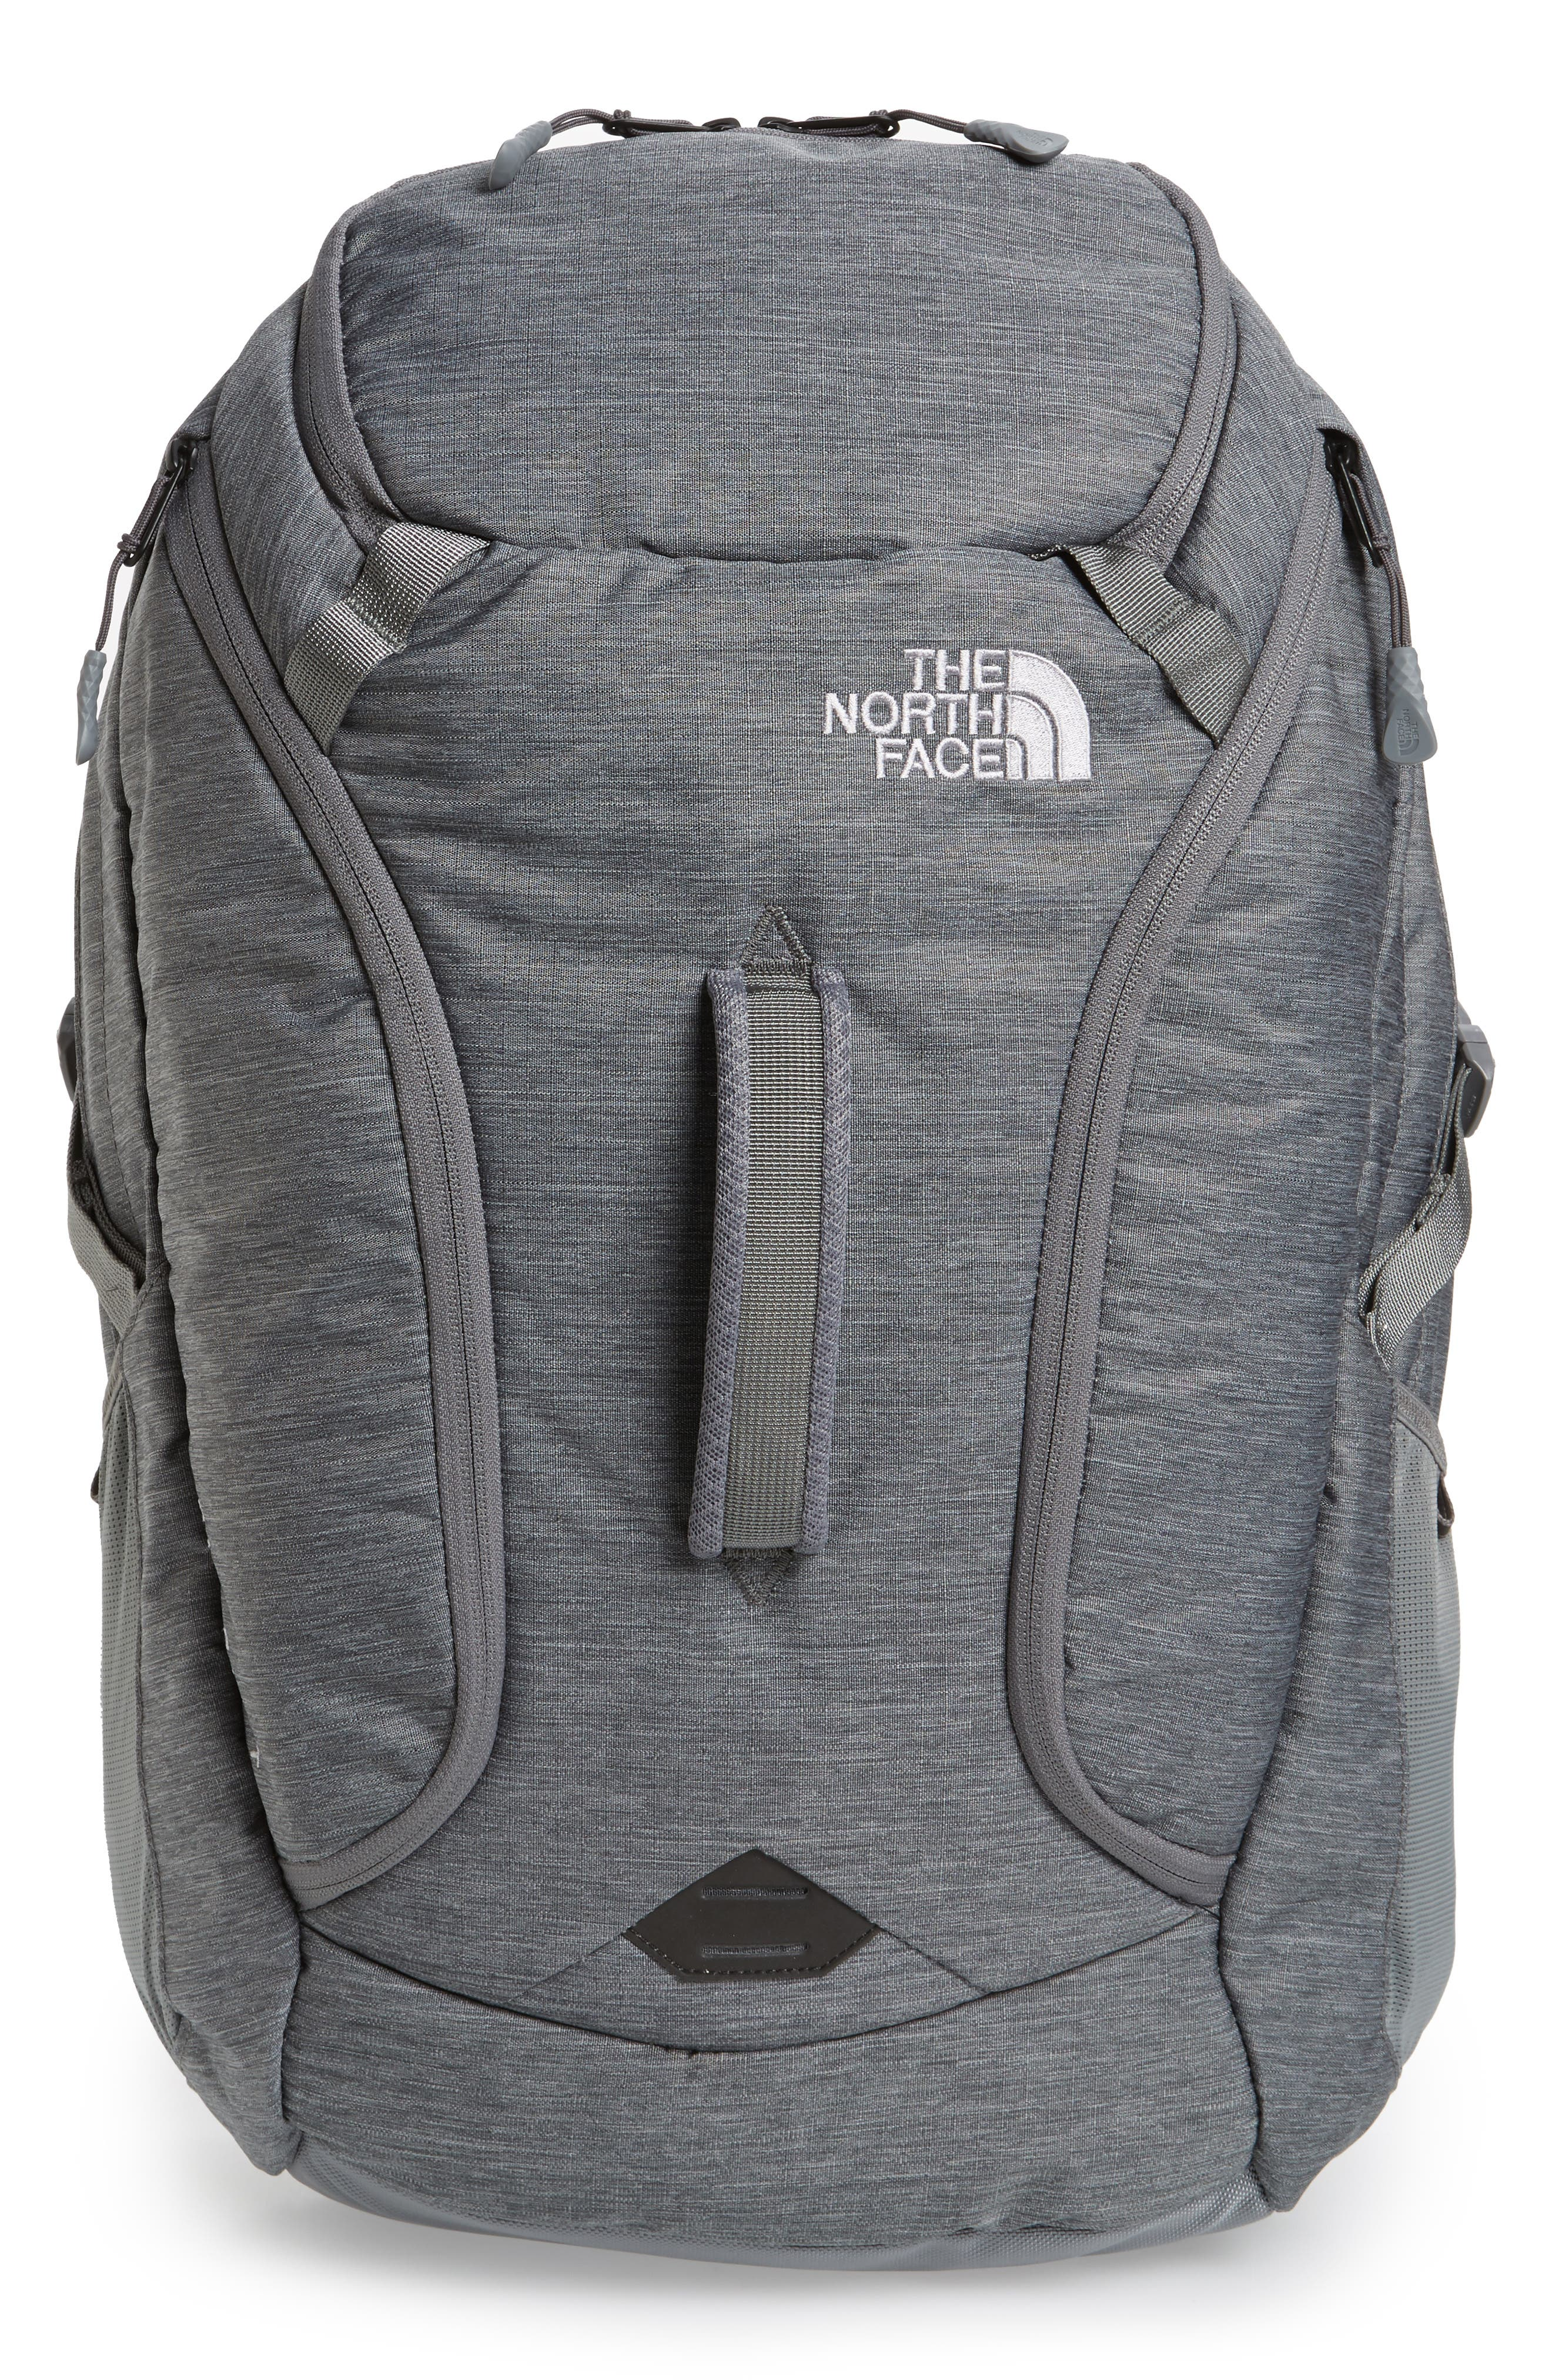 Alternate Image 1 Selected - The North Face Big Shot Backpack